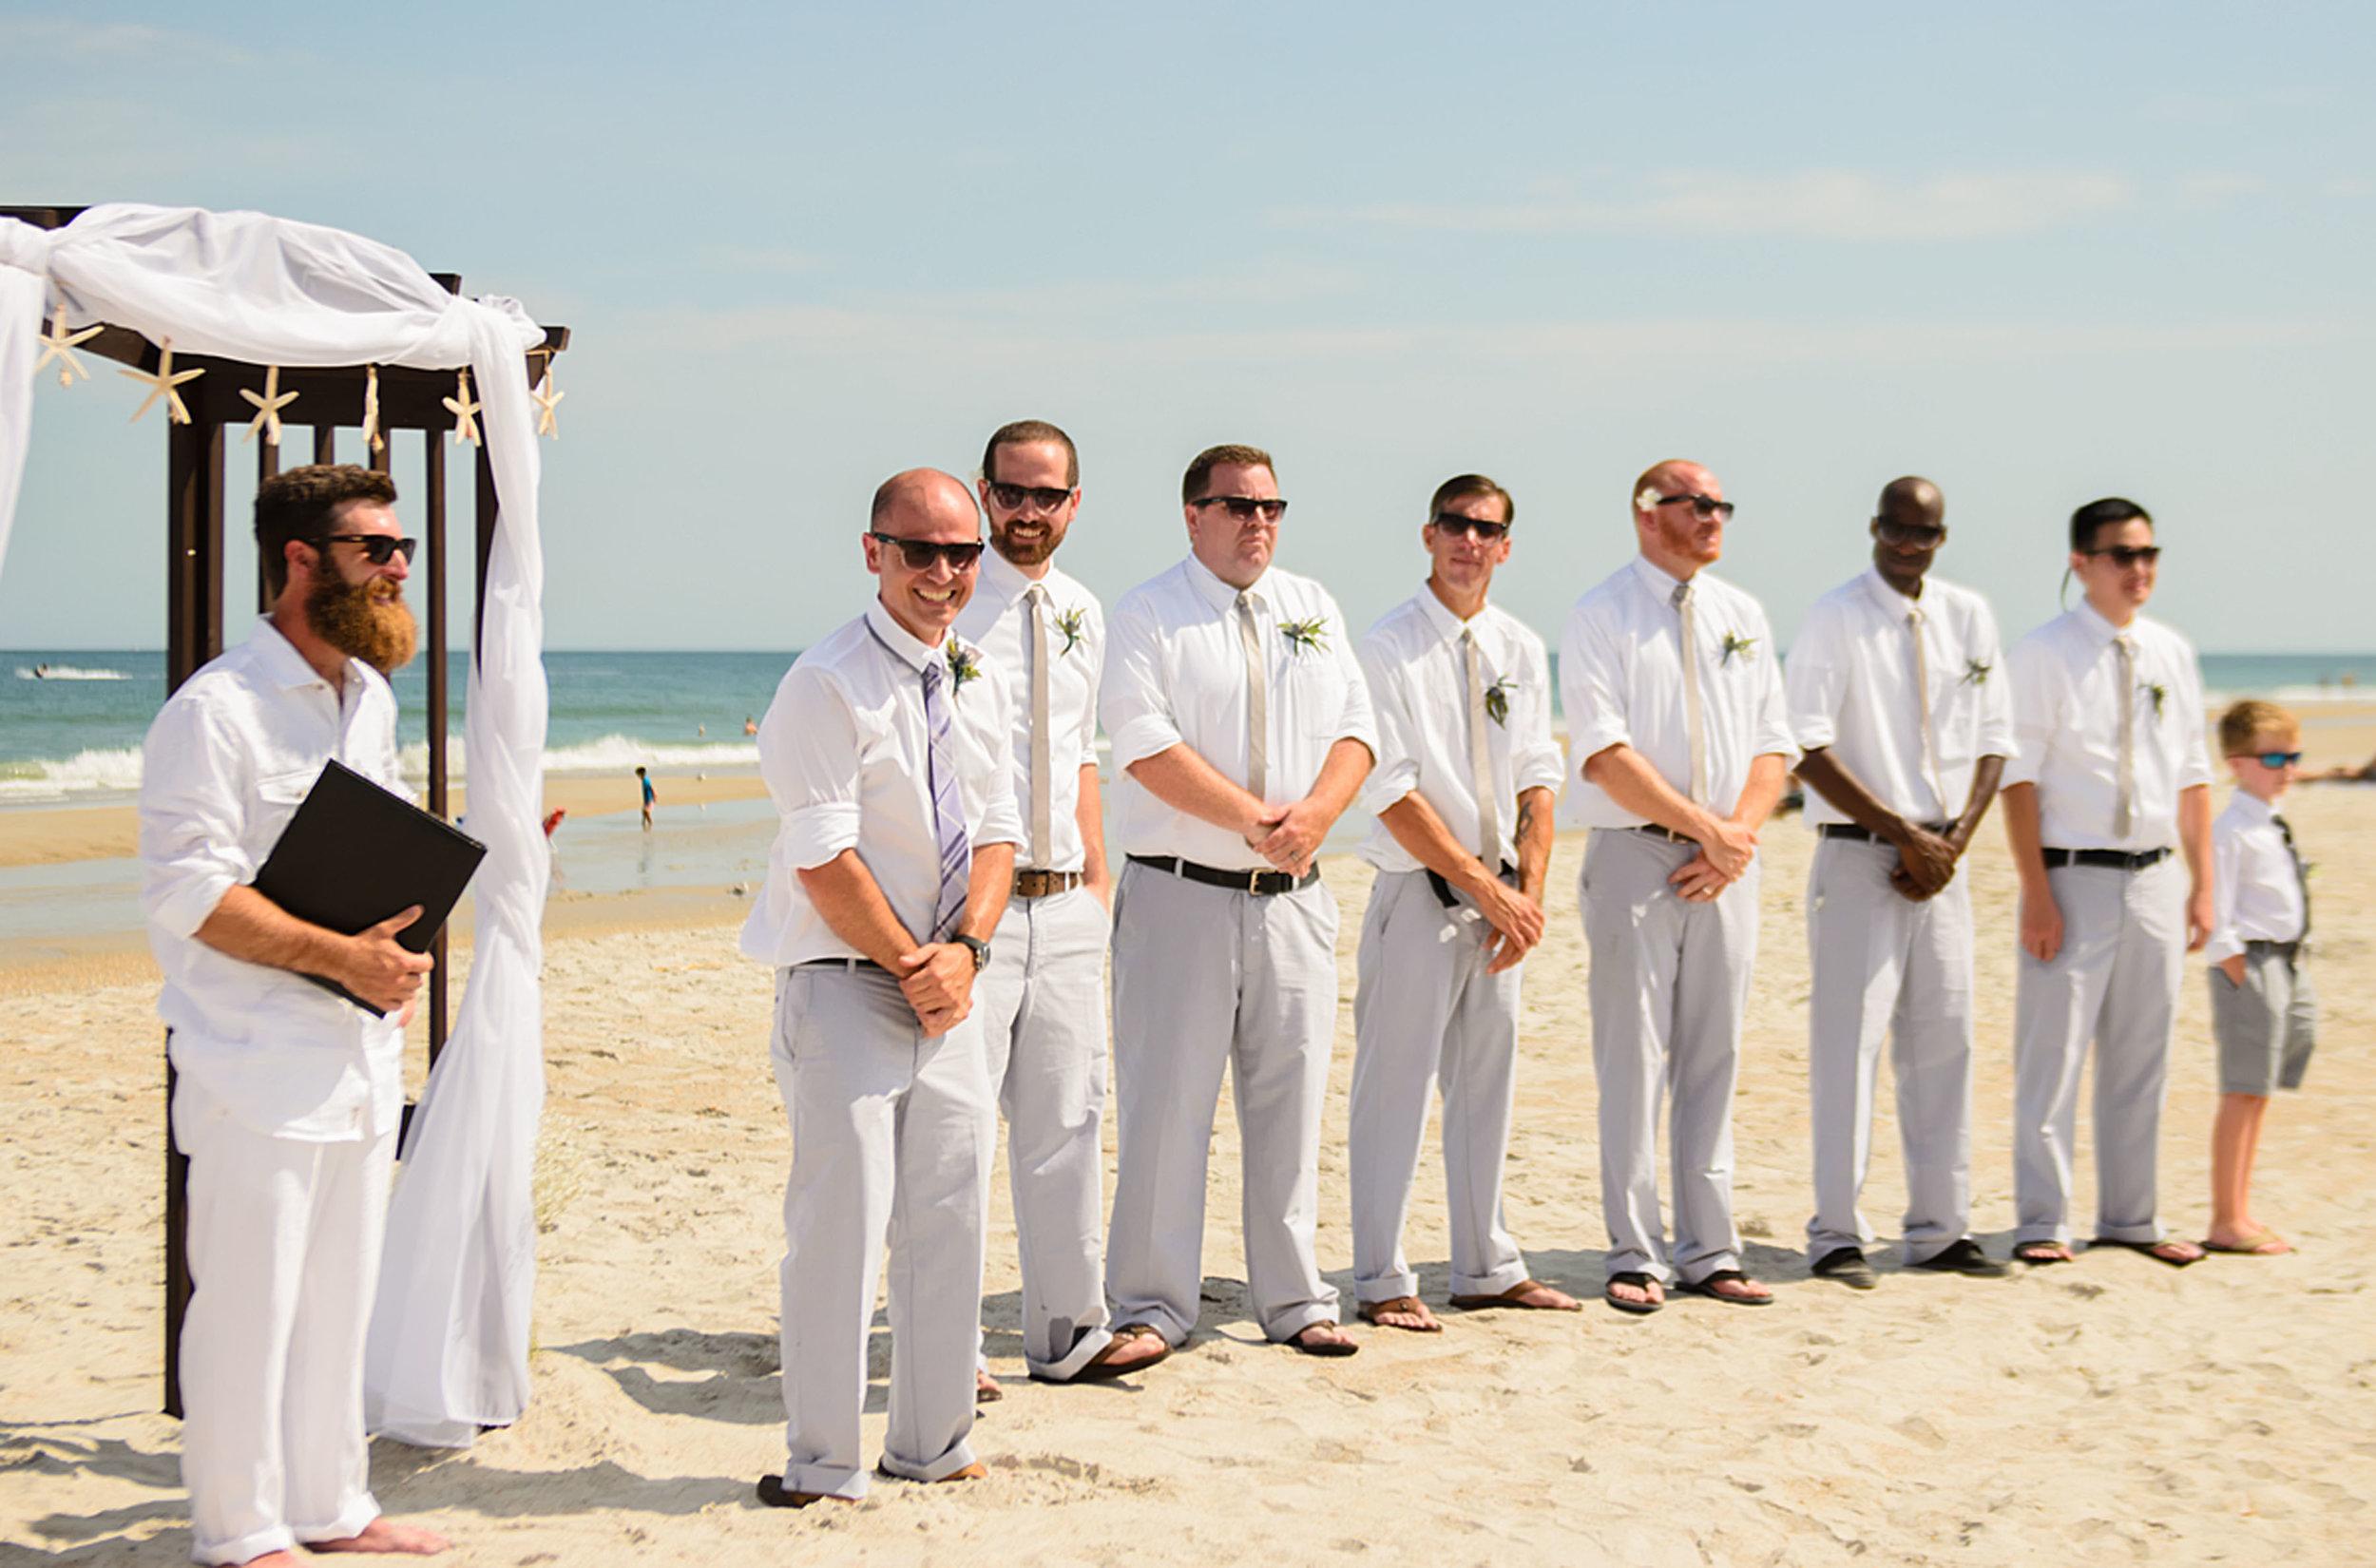 North_Carolina_Wedding_Photographer_Tiffany_Abruzzo_Ceremony_15.1.jpg